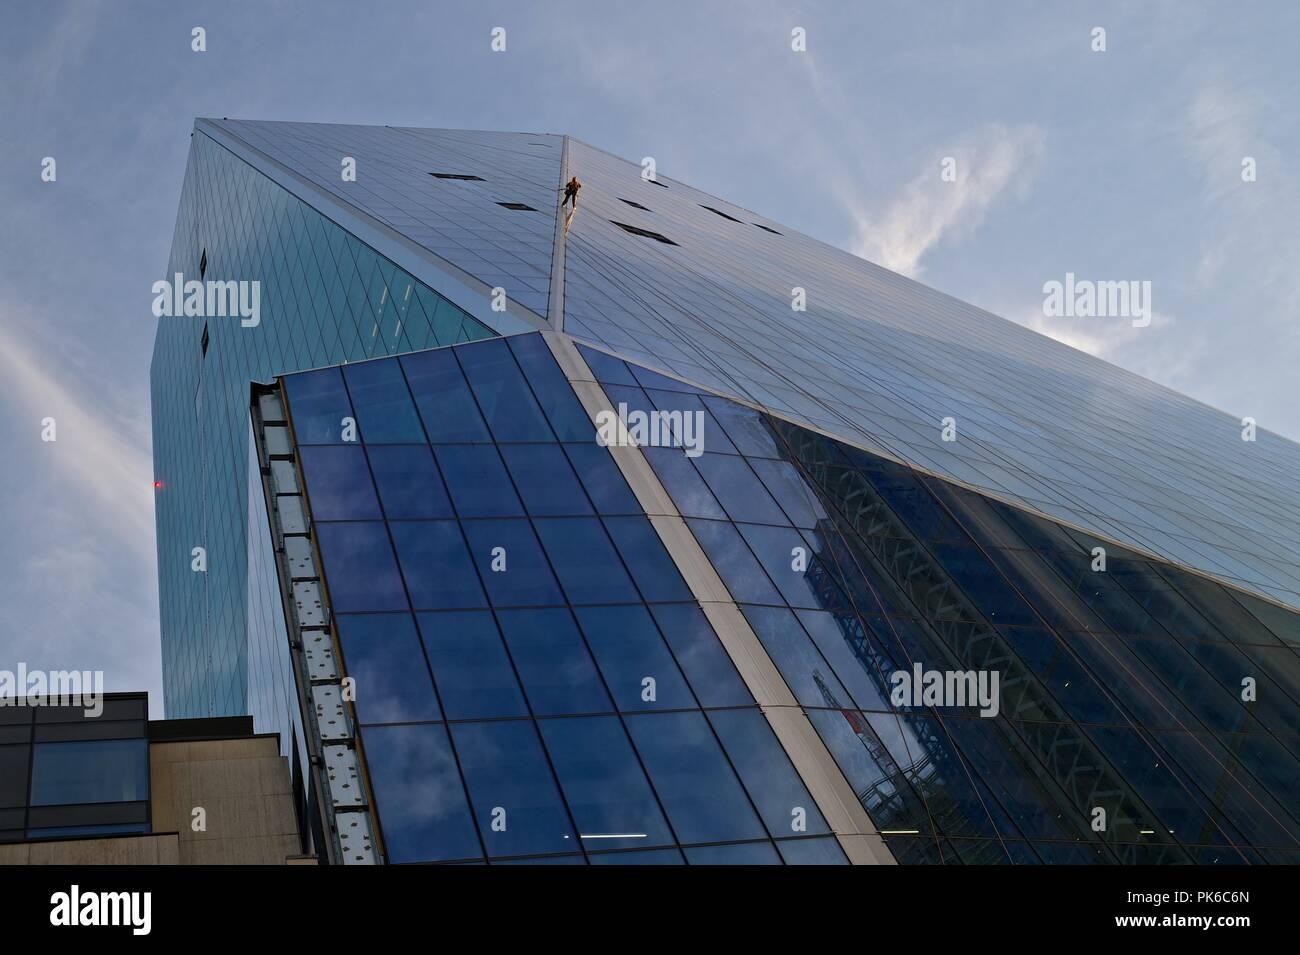 Scalpel, London's newest sky scraper - Stock Image